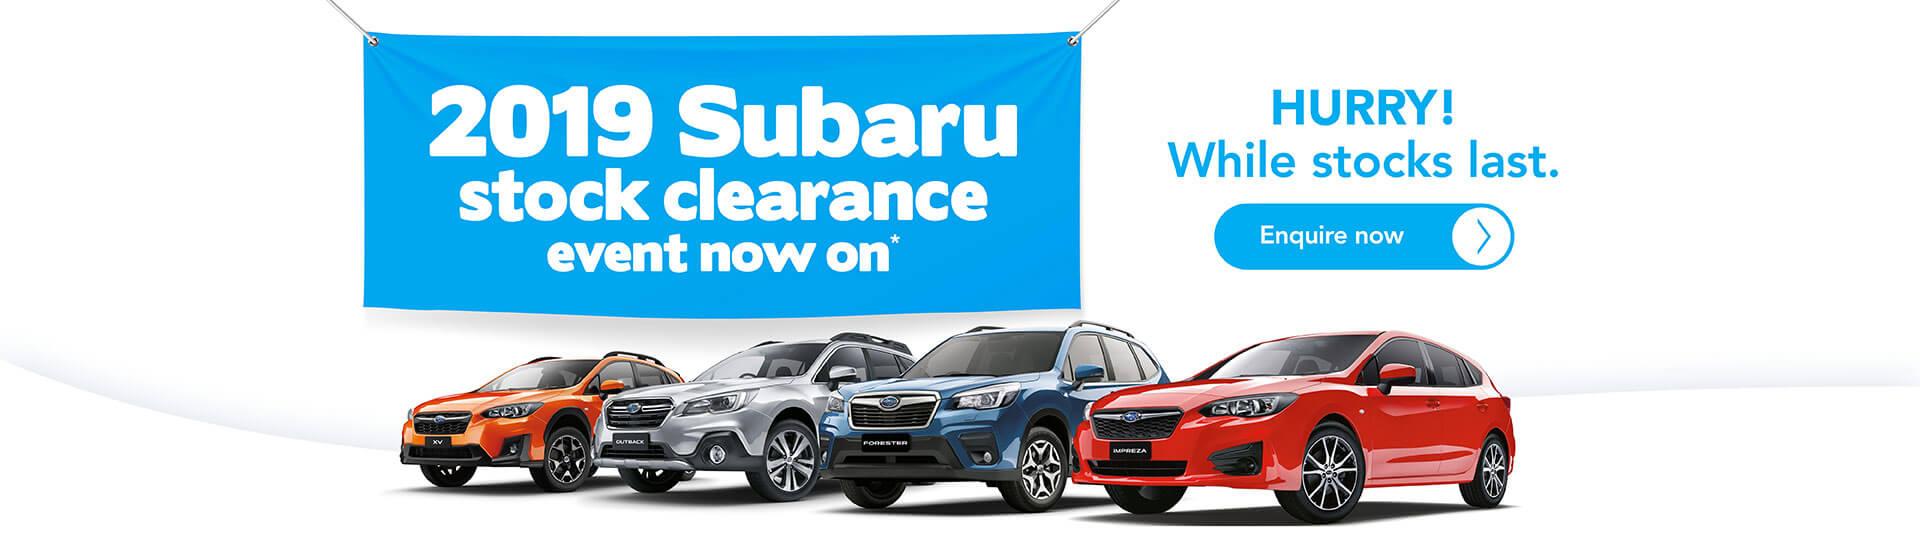 Bathurst Automotive Group subaru offers